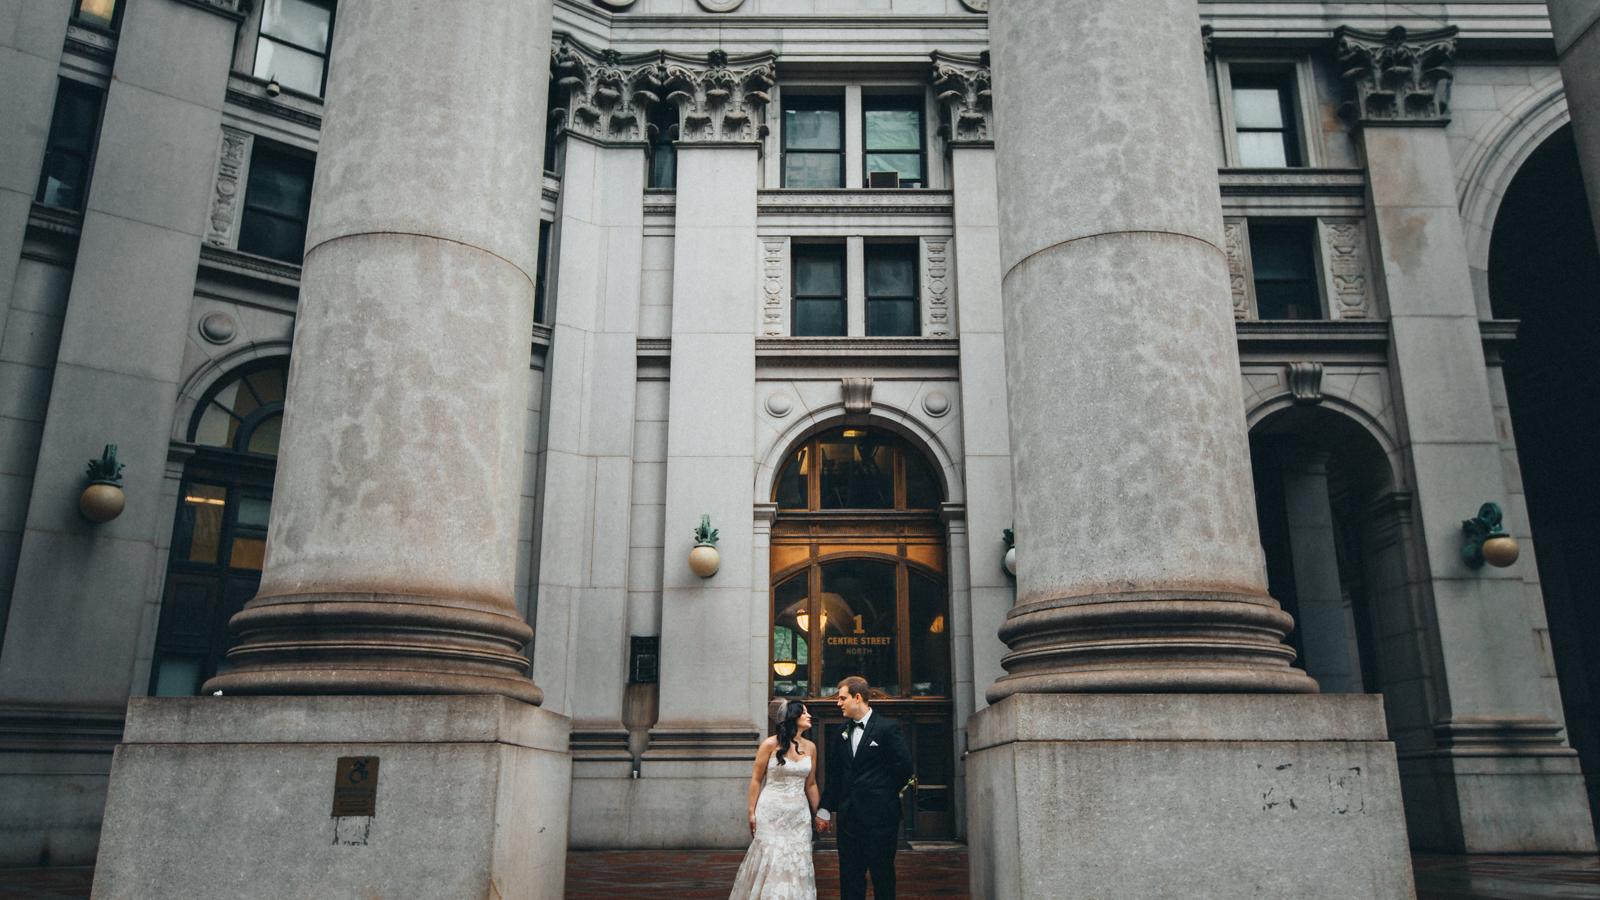 NYC Wedding Photography Lofts at Prince Brooklyn NYC Photographer Boris Zaretsky _B2C7857.jpg